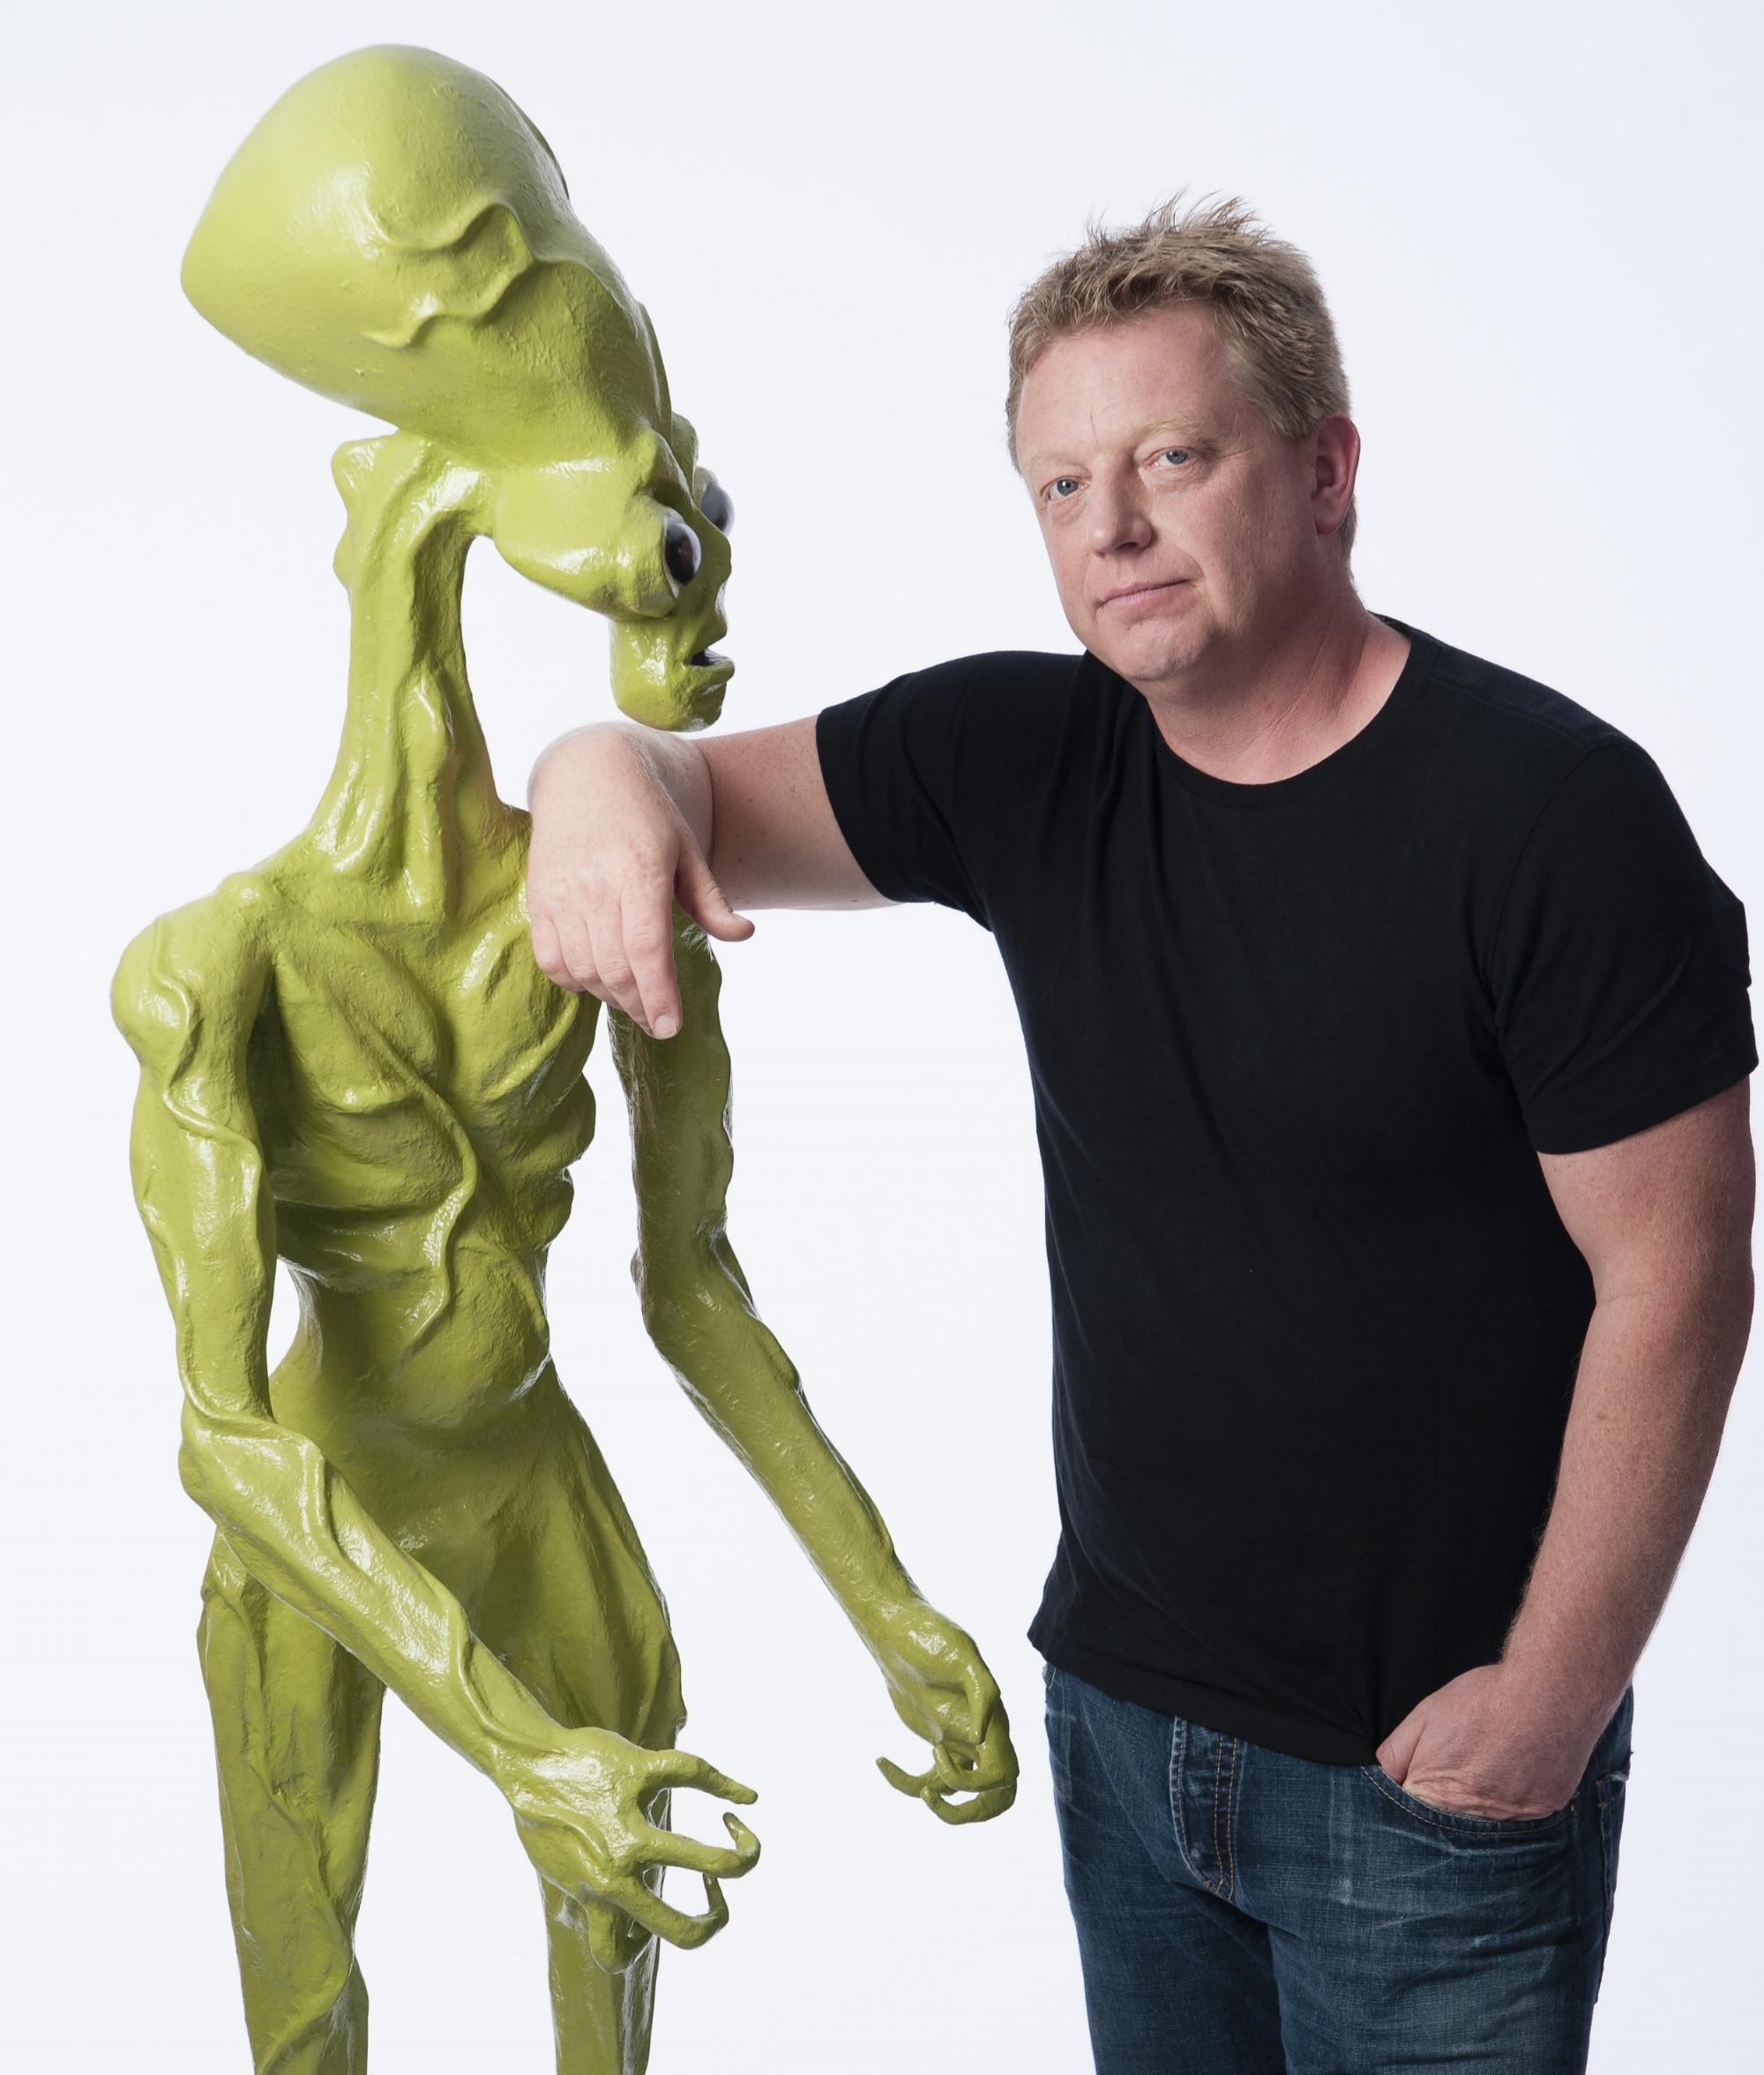 LQ - Jeff and his friend alien 2.jpg